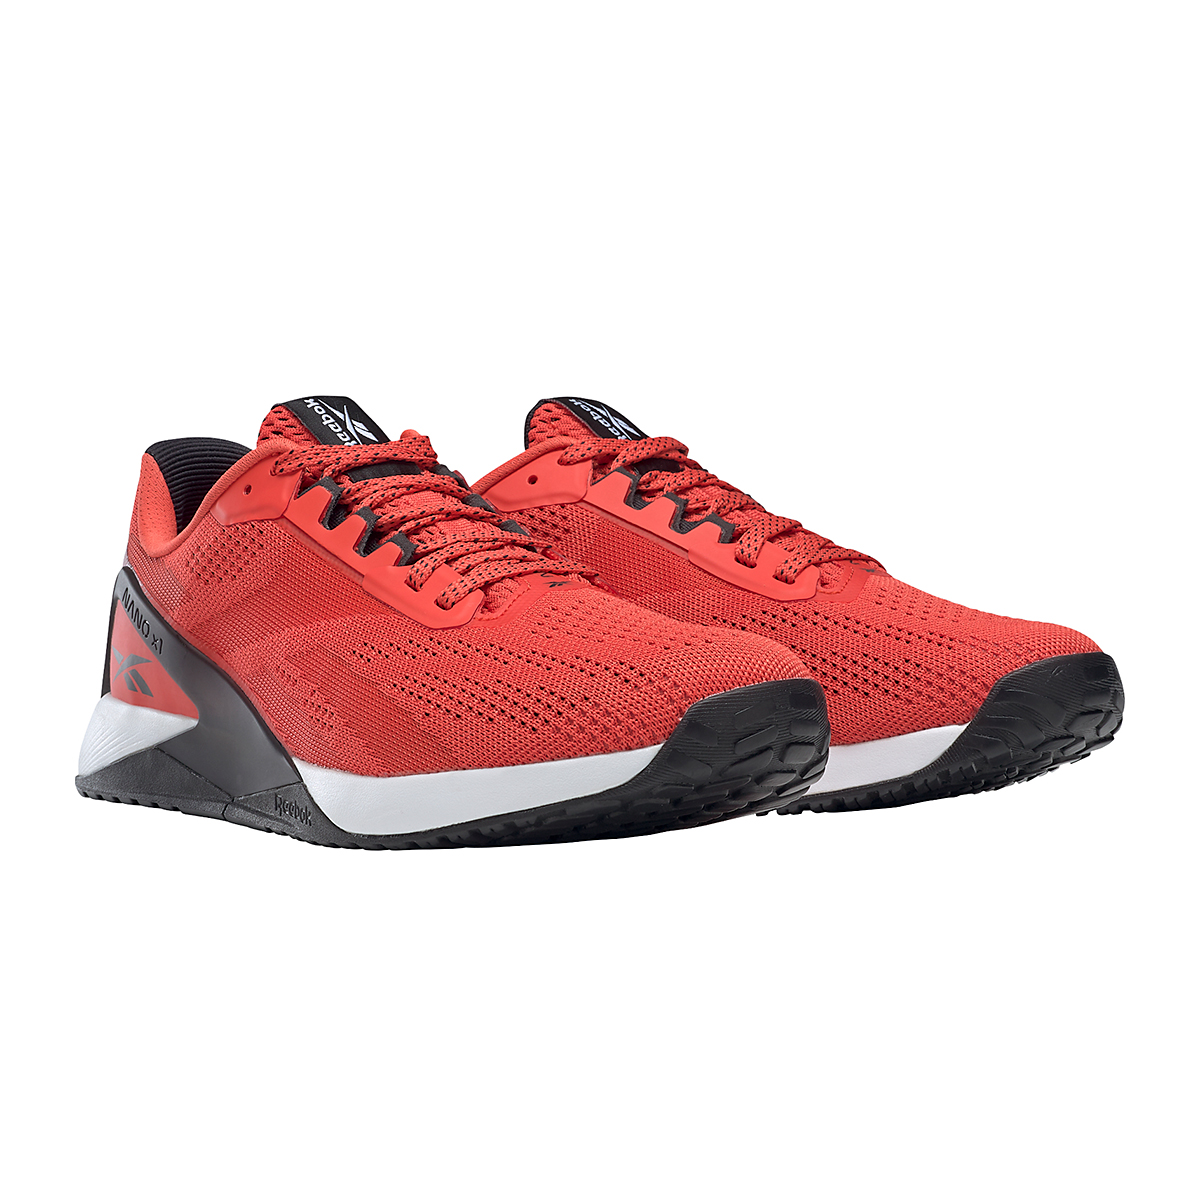 Men's Reebok Nano X1 Training Shoe - Color: Dynamic Red/White/Black - Size: 6.5 - Width: Regular, Dynamic Red/White/Black, large, image 5